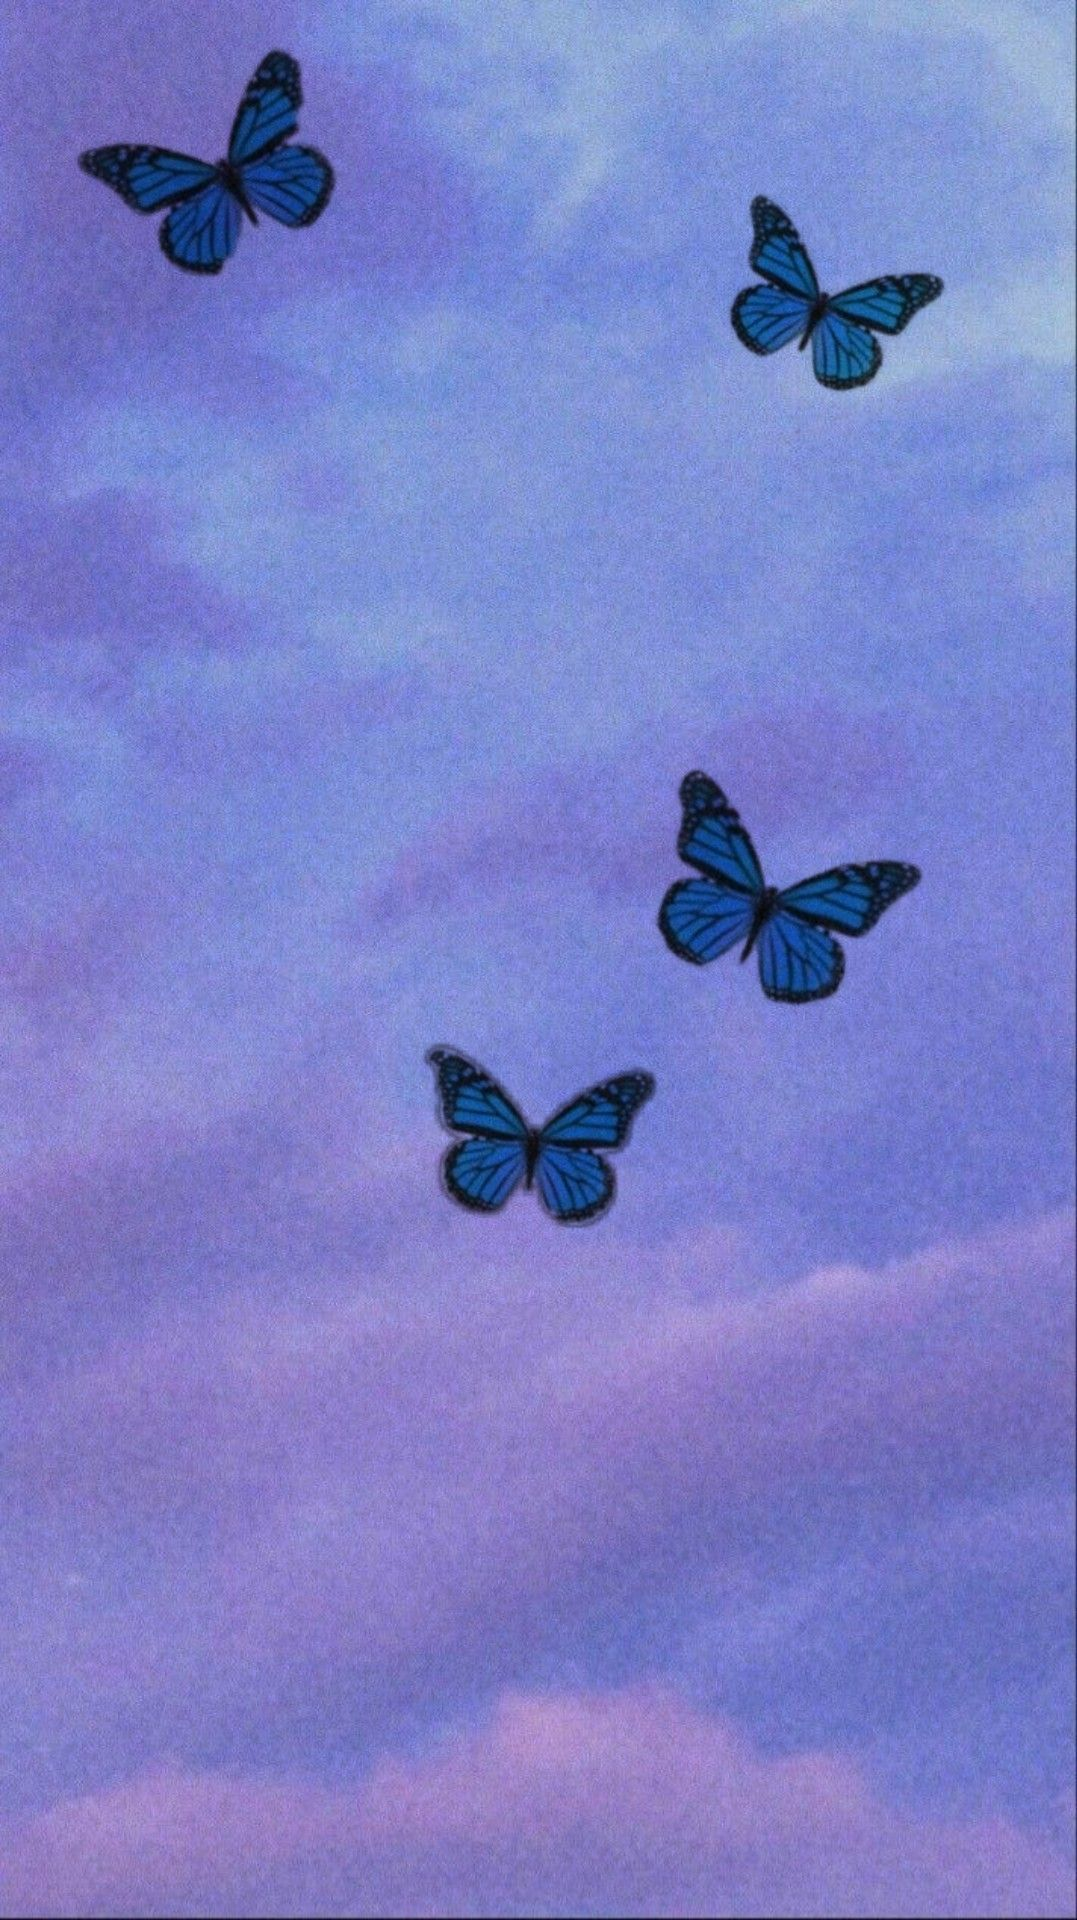 #butterfly #iphone wallpaper aesthetic pastel #wallpaper ...